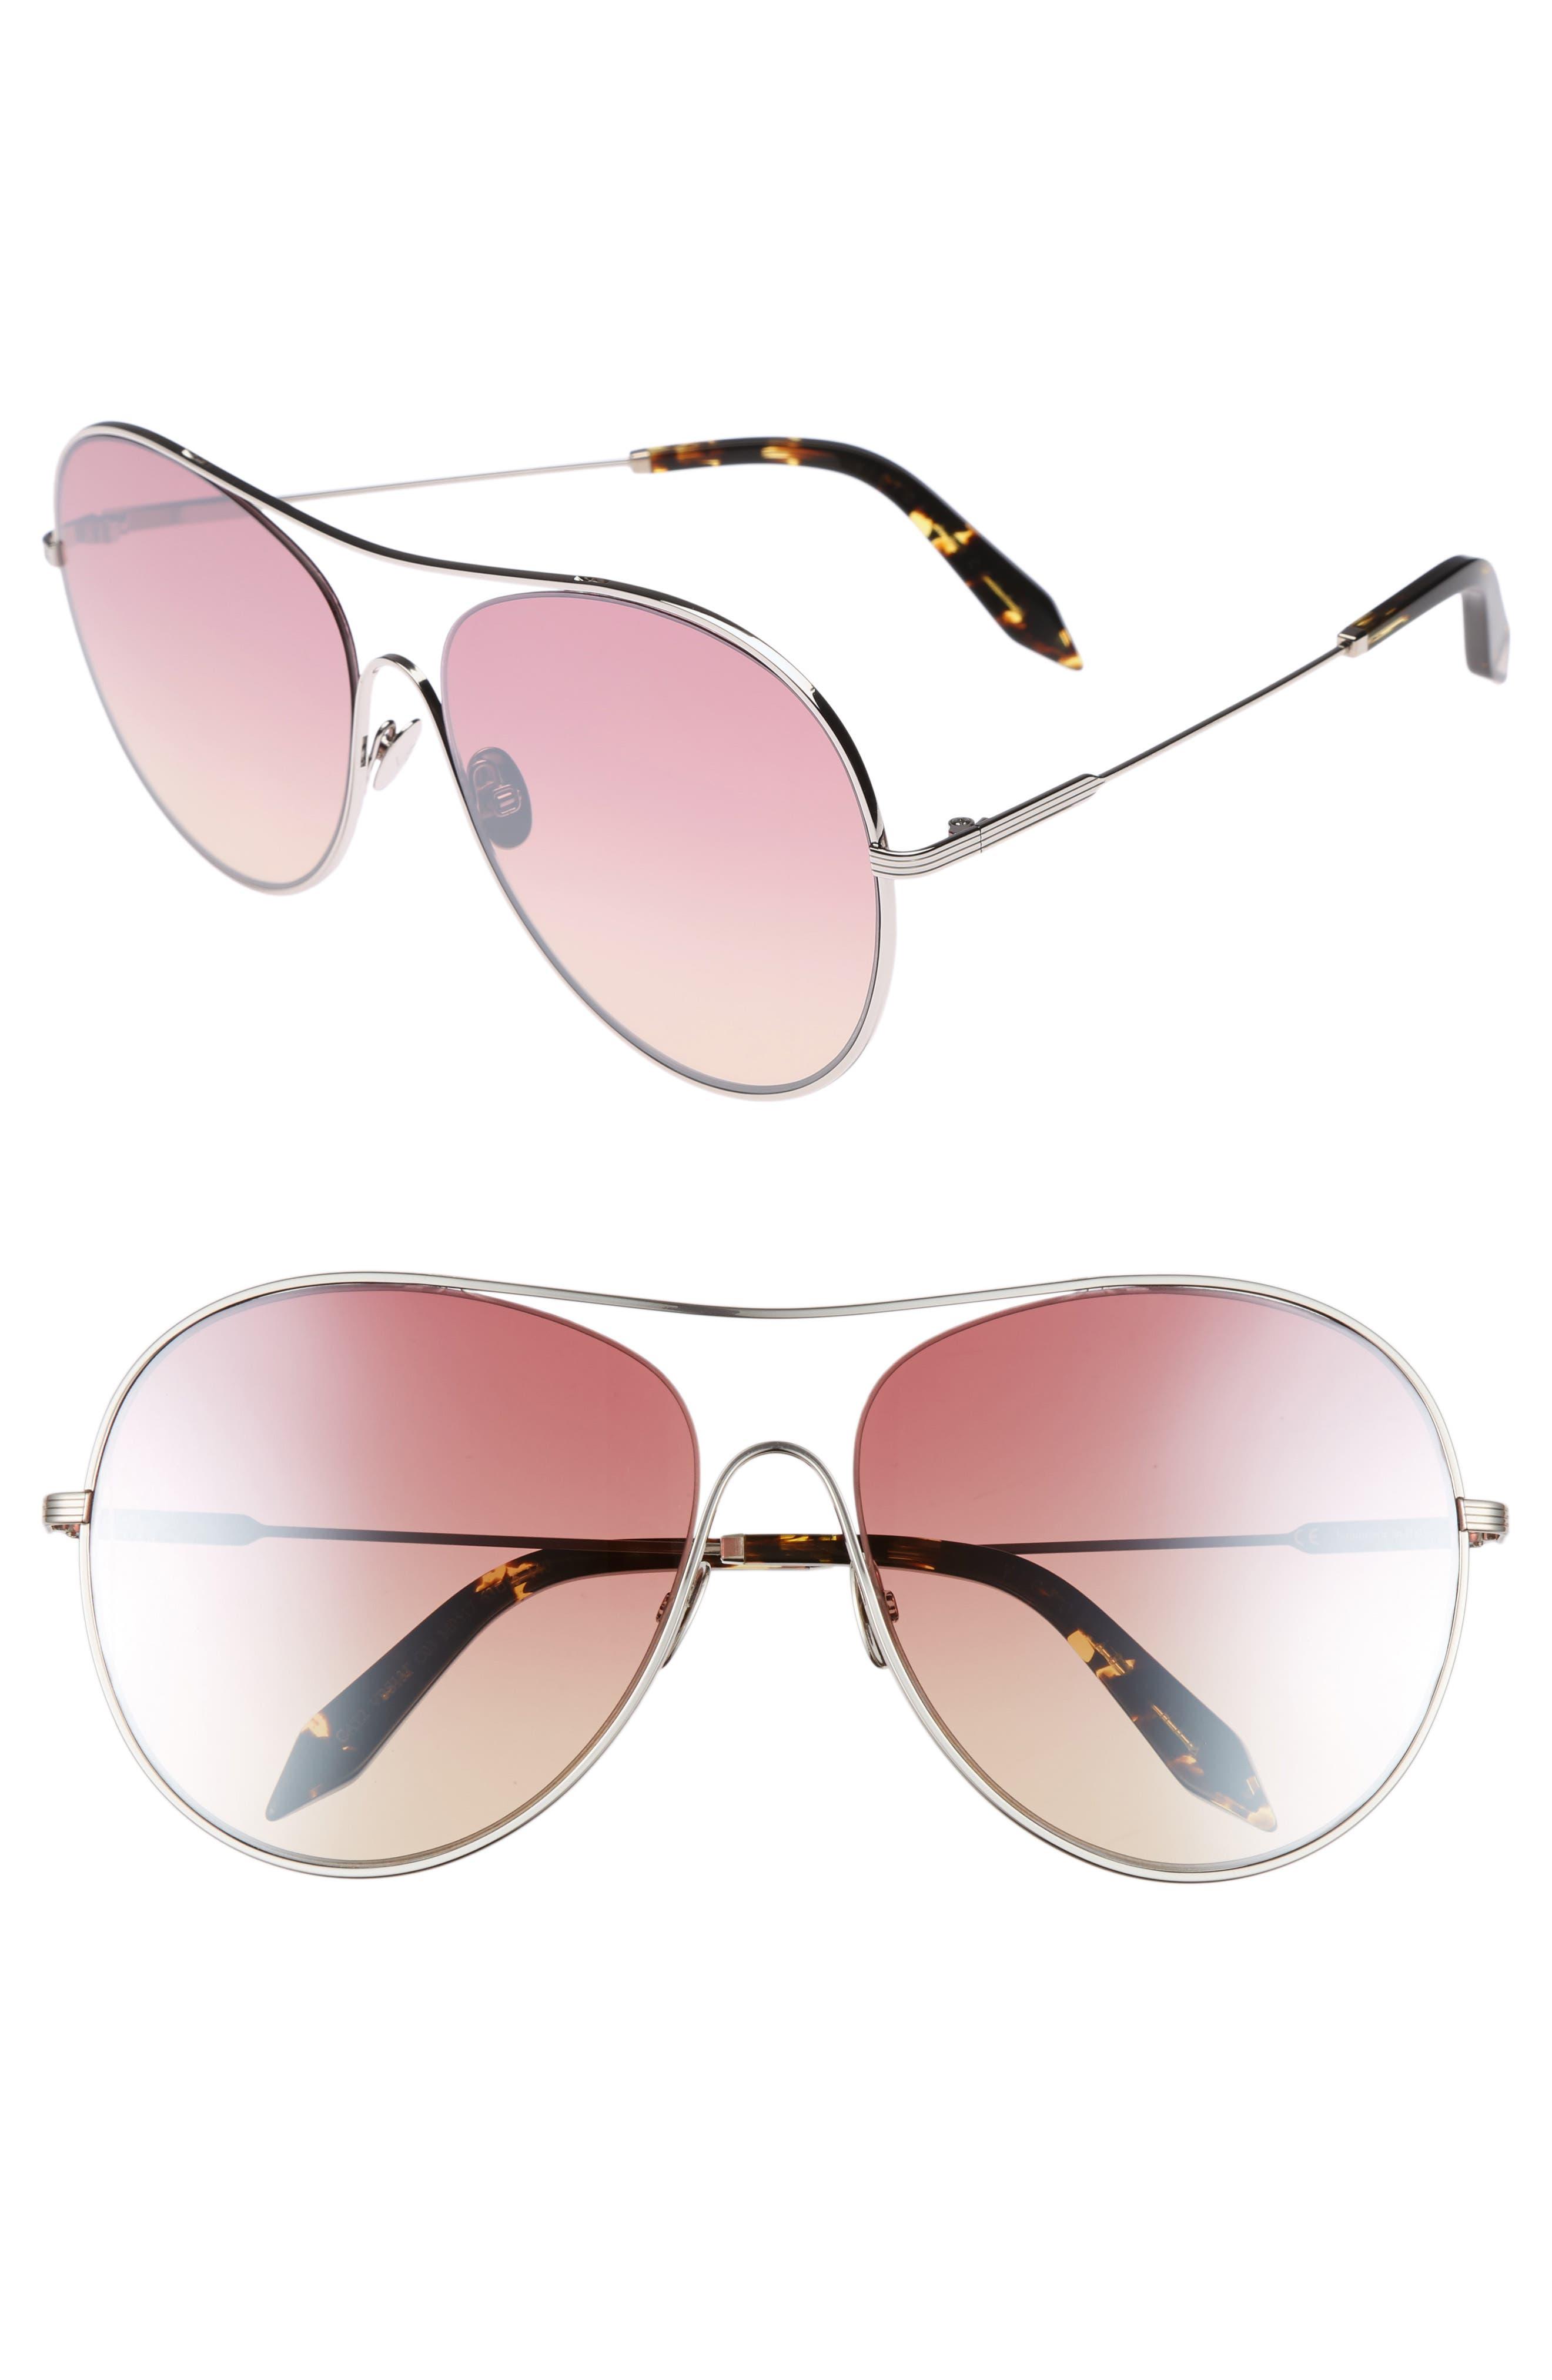 Main Image - Victoria Beckham Loop 63mm Oversize Round Sunglasses